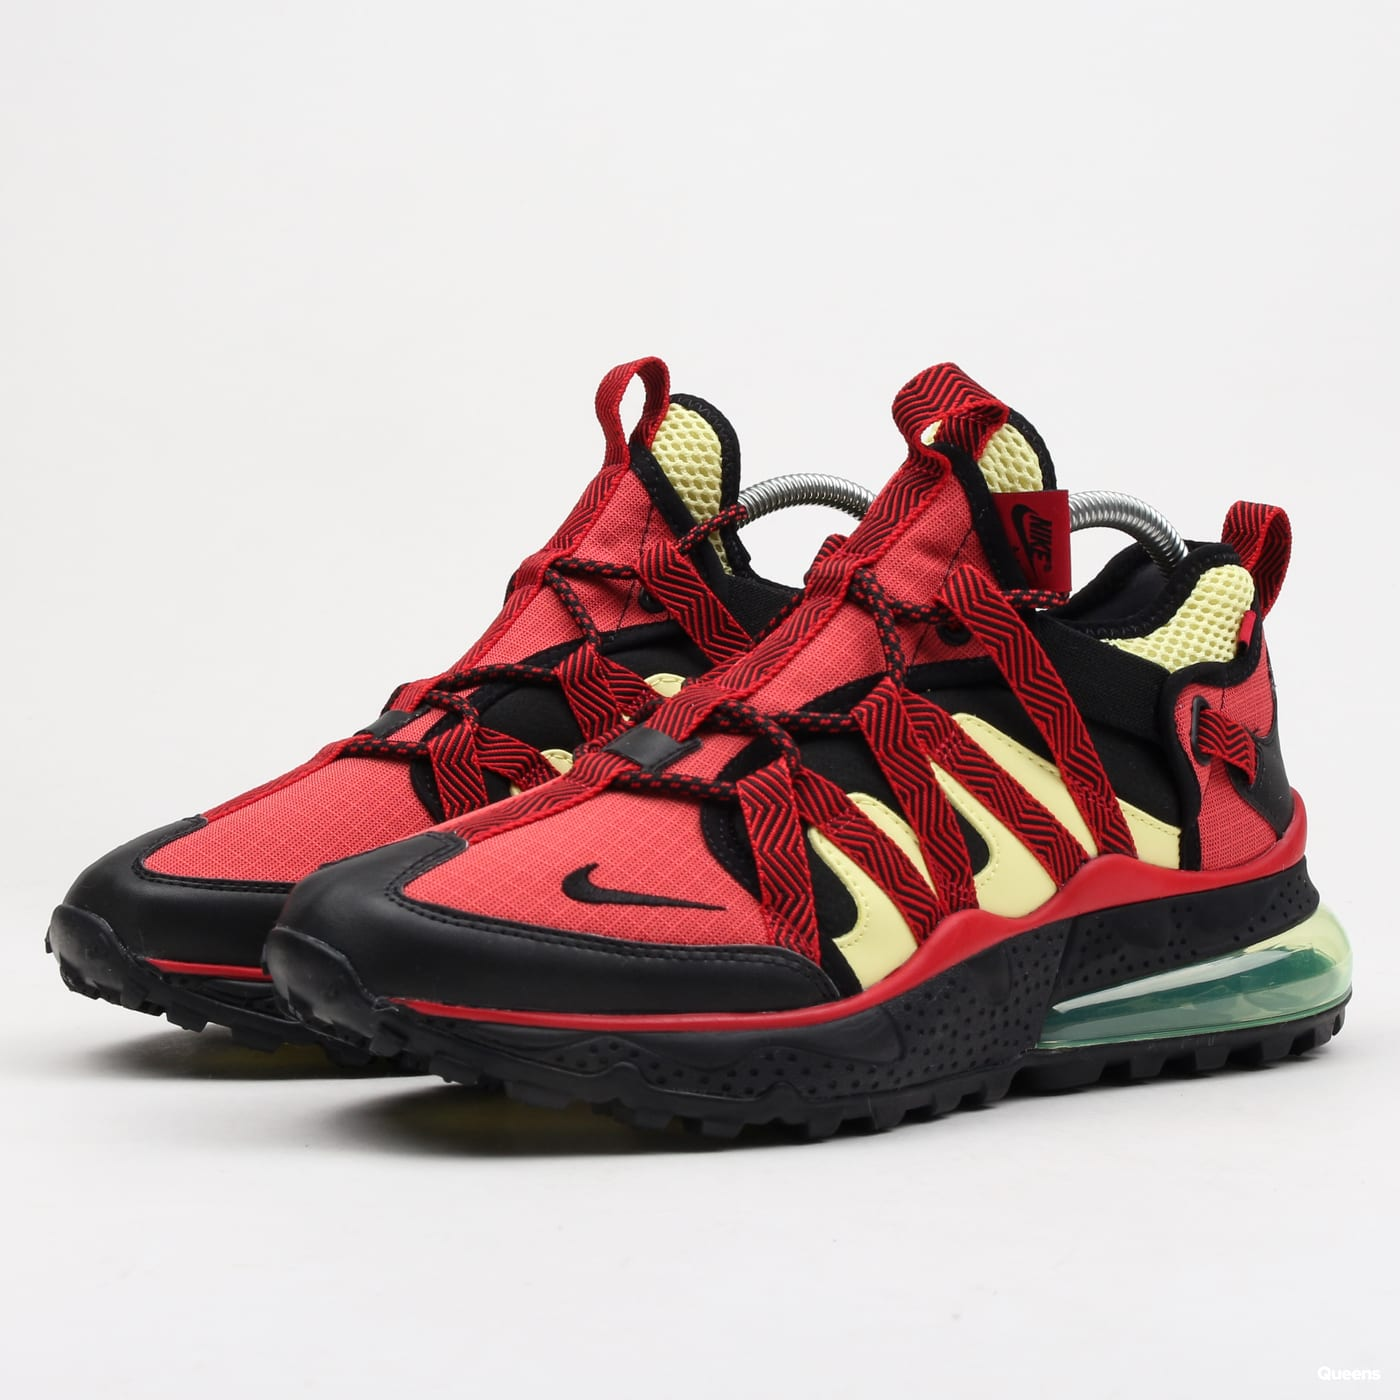 Nike Air Max 270 Bowfin black / black - university red